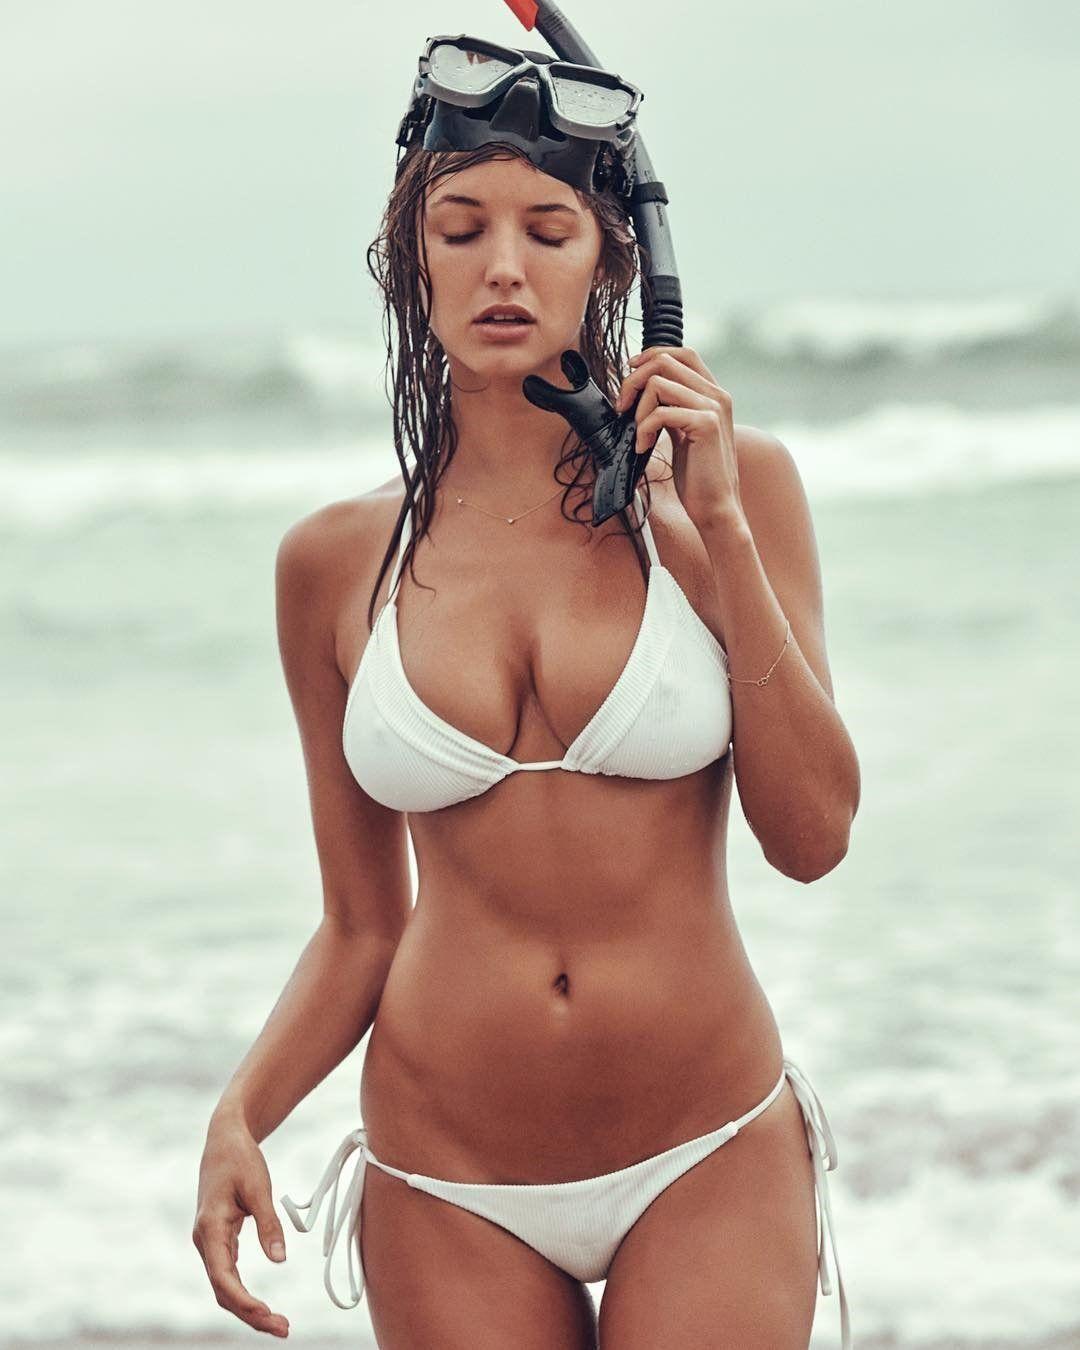 Bikini Alyssa Lee nude photos 2019